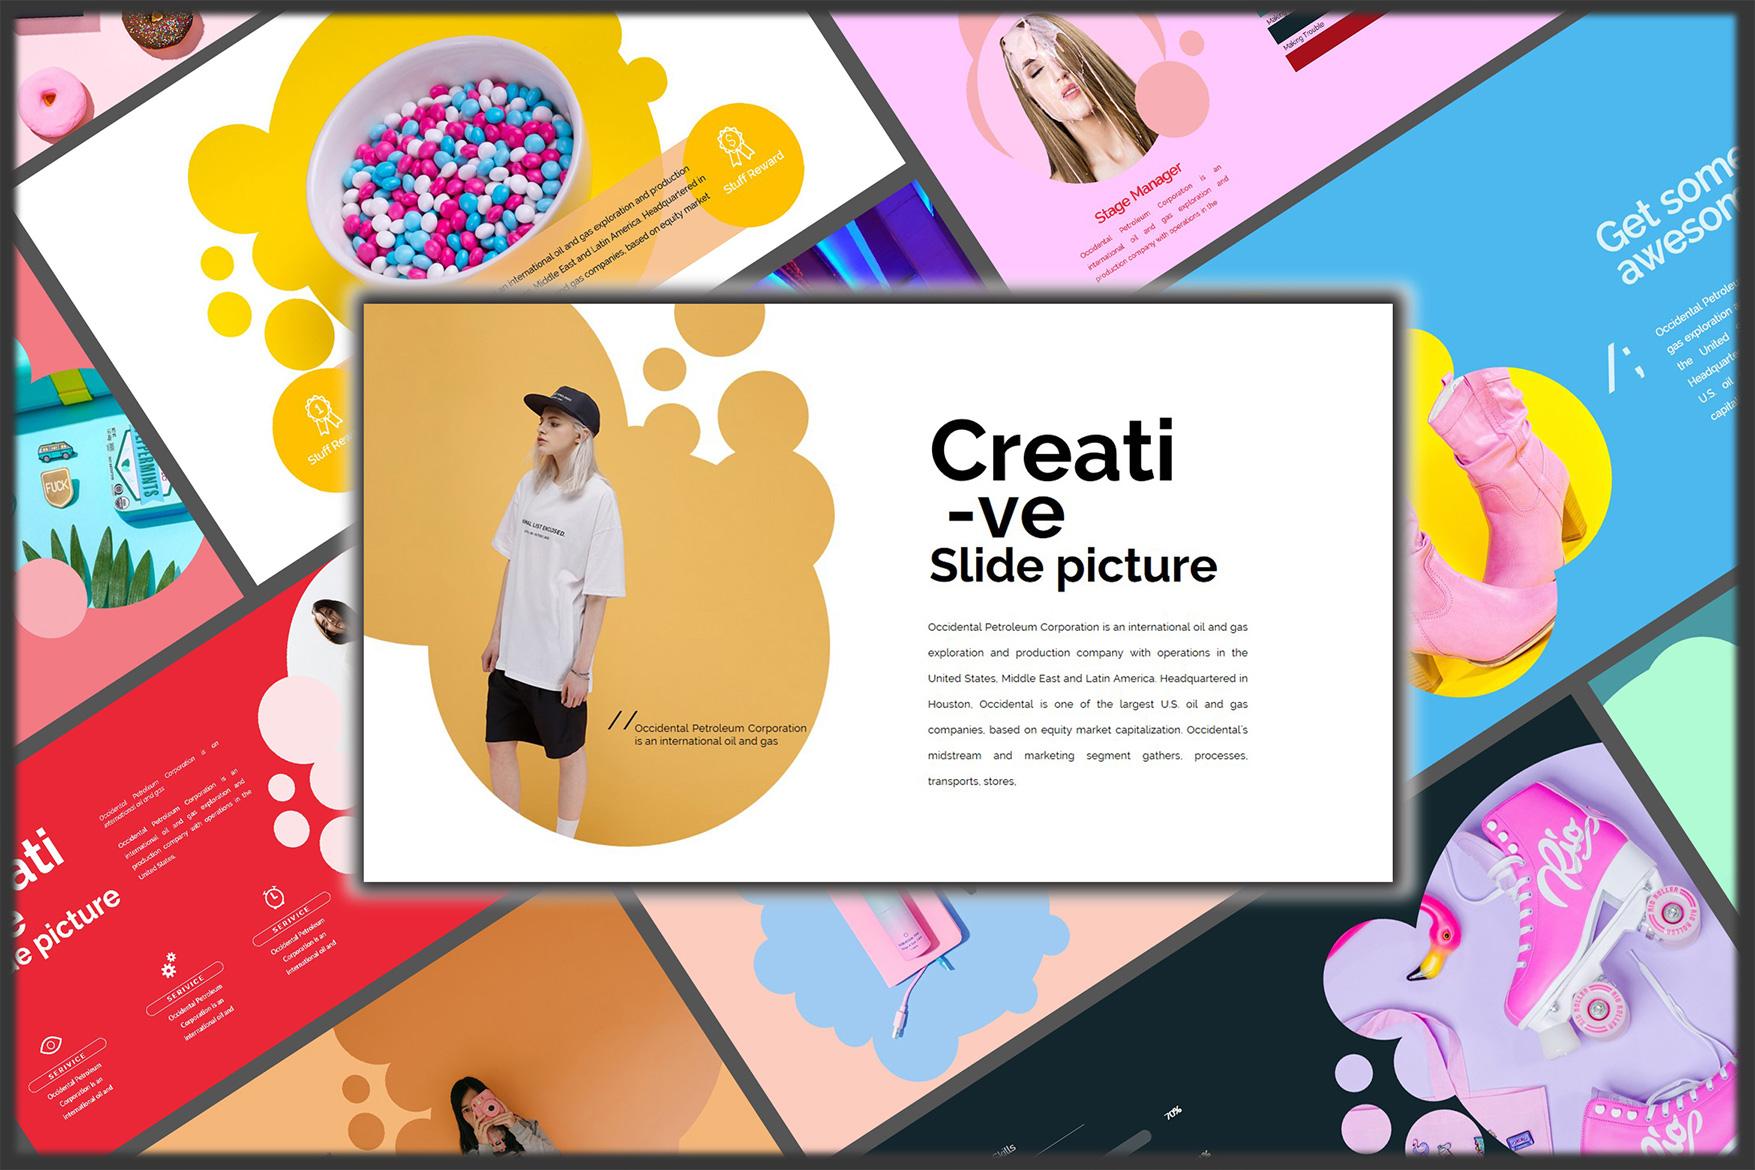 Velvety Fashion Google Slides Presentation example image 1